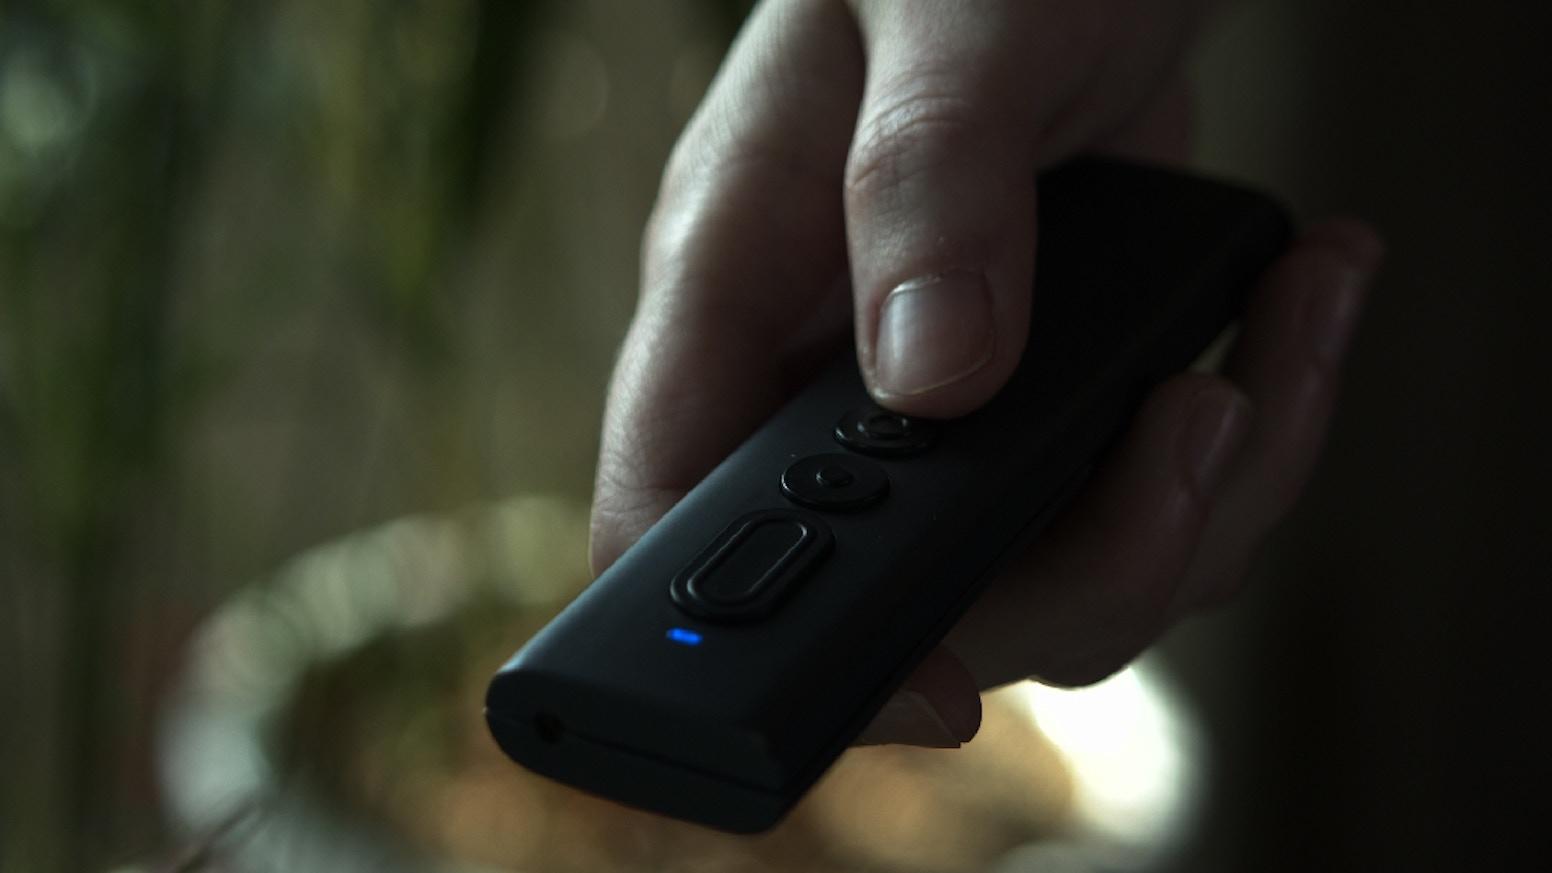 Retro Style Wireless Presentation Remote - Gyro-Sensor , Anti Shake, Red Lazer, Magnifying, Air Pen Mode, RF 2.4Ghz Wireless.